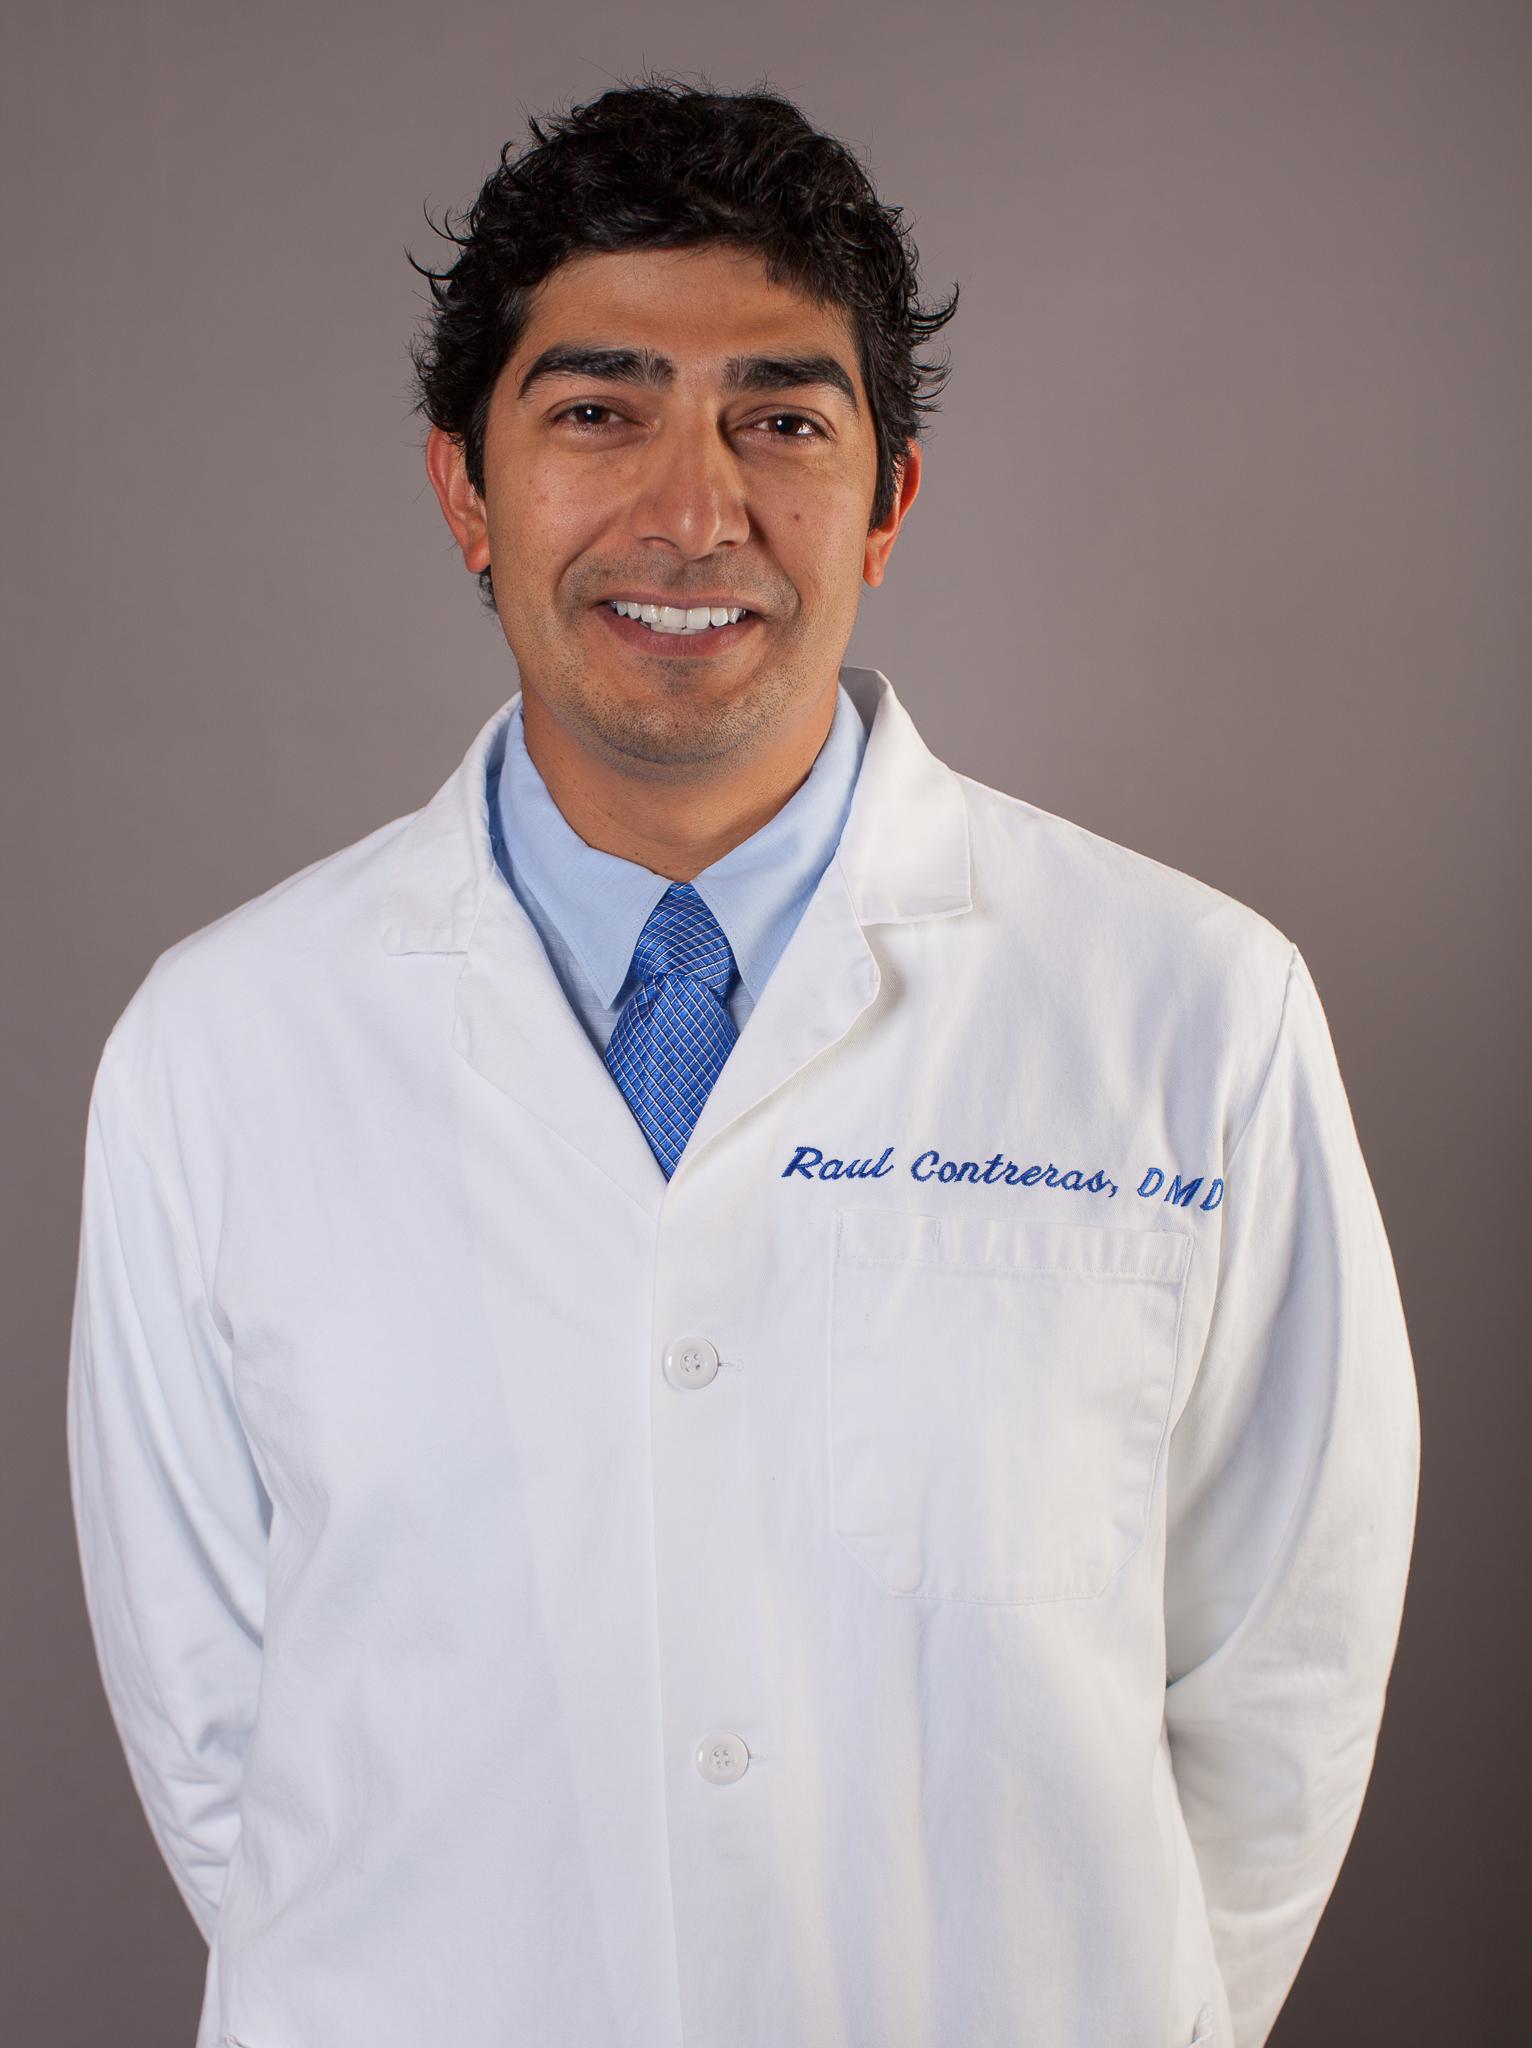 Dr. Raul Contreras